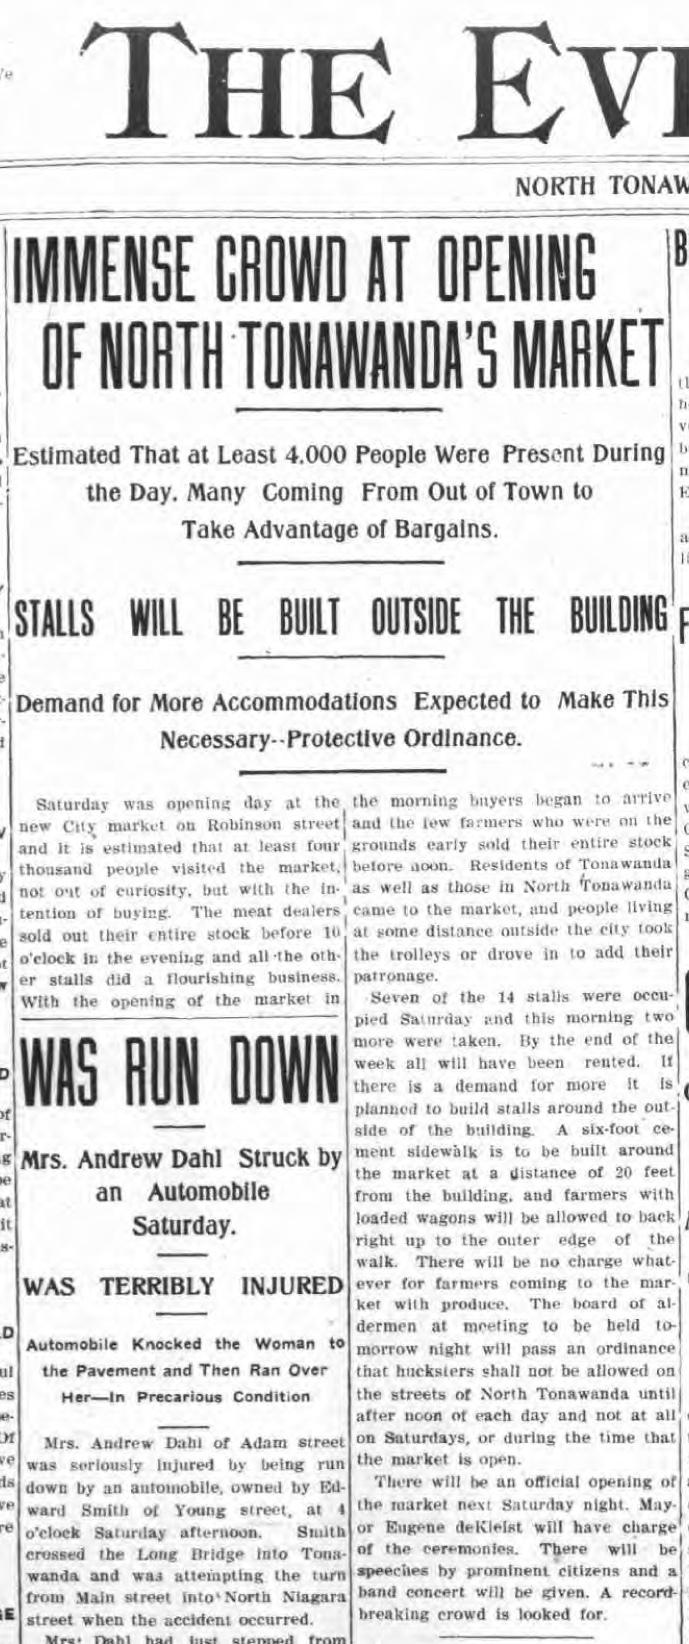 Immense Crowds at Opening of NT Market, article (Tonawanda News, 1908-08-17).jpg